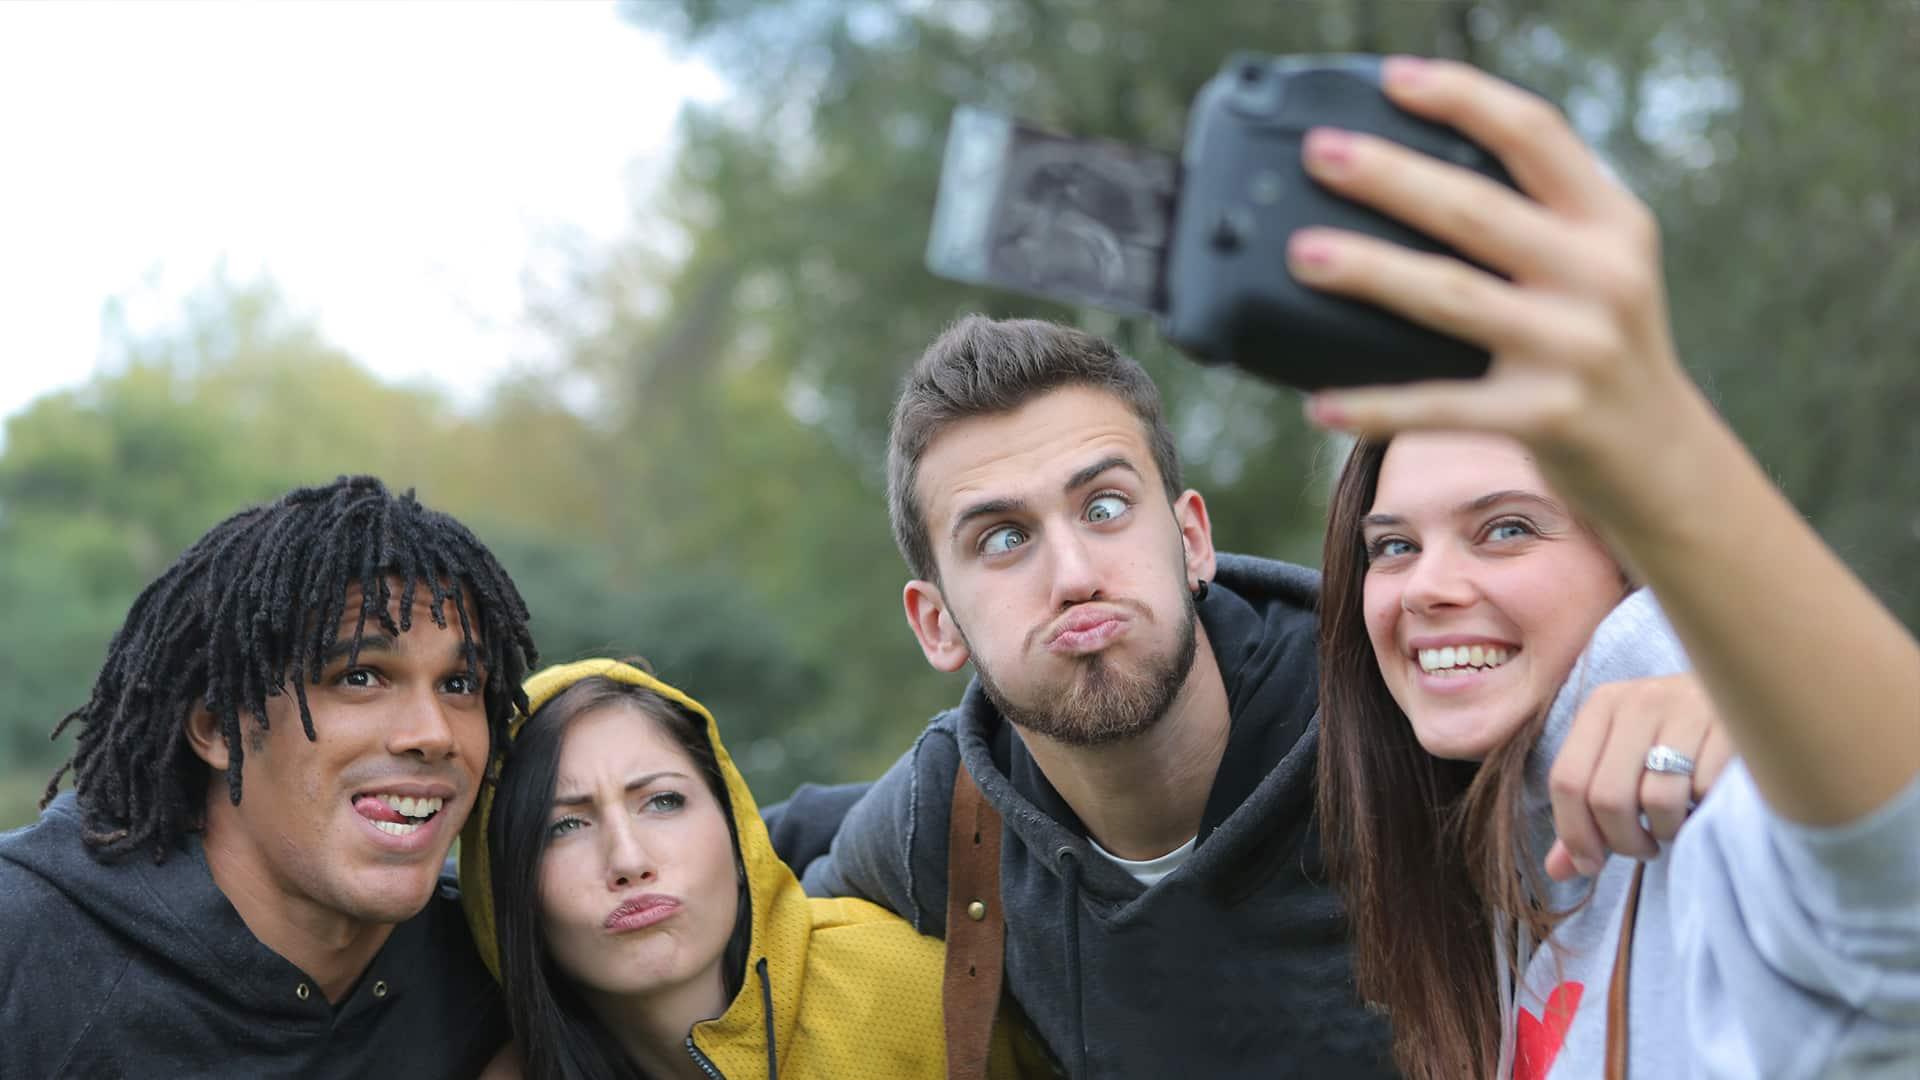 fografias_ilicitas_contexto_escolar_foto_selfie